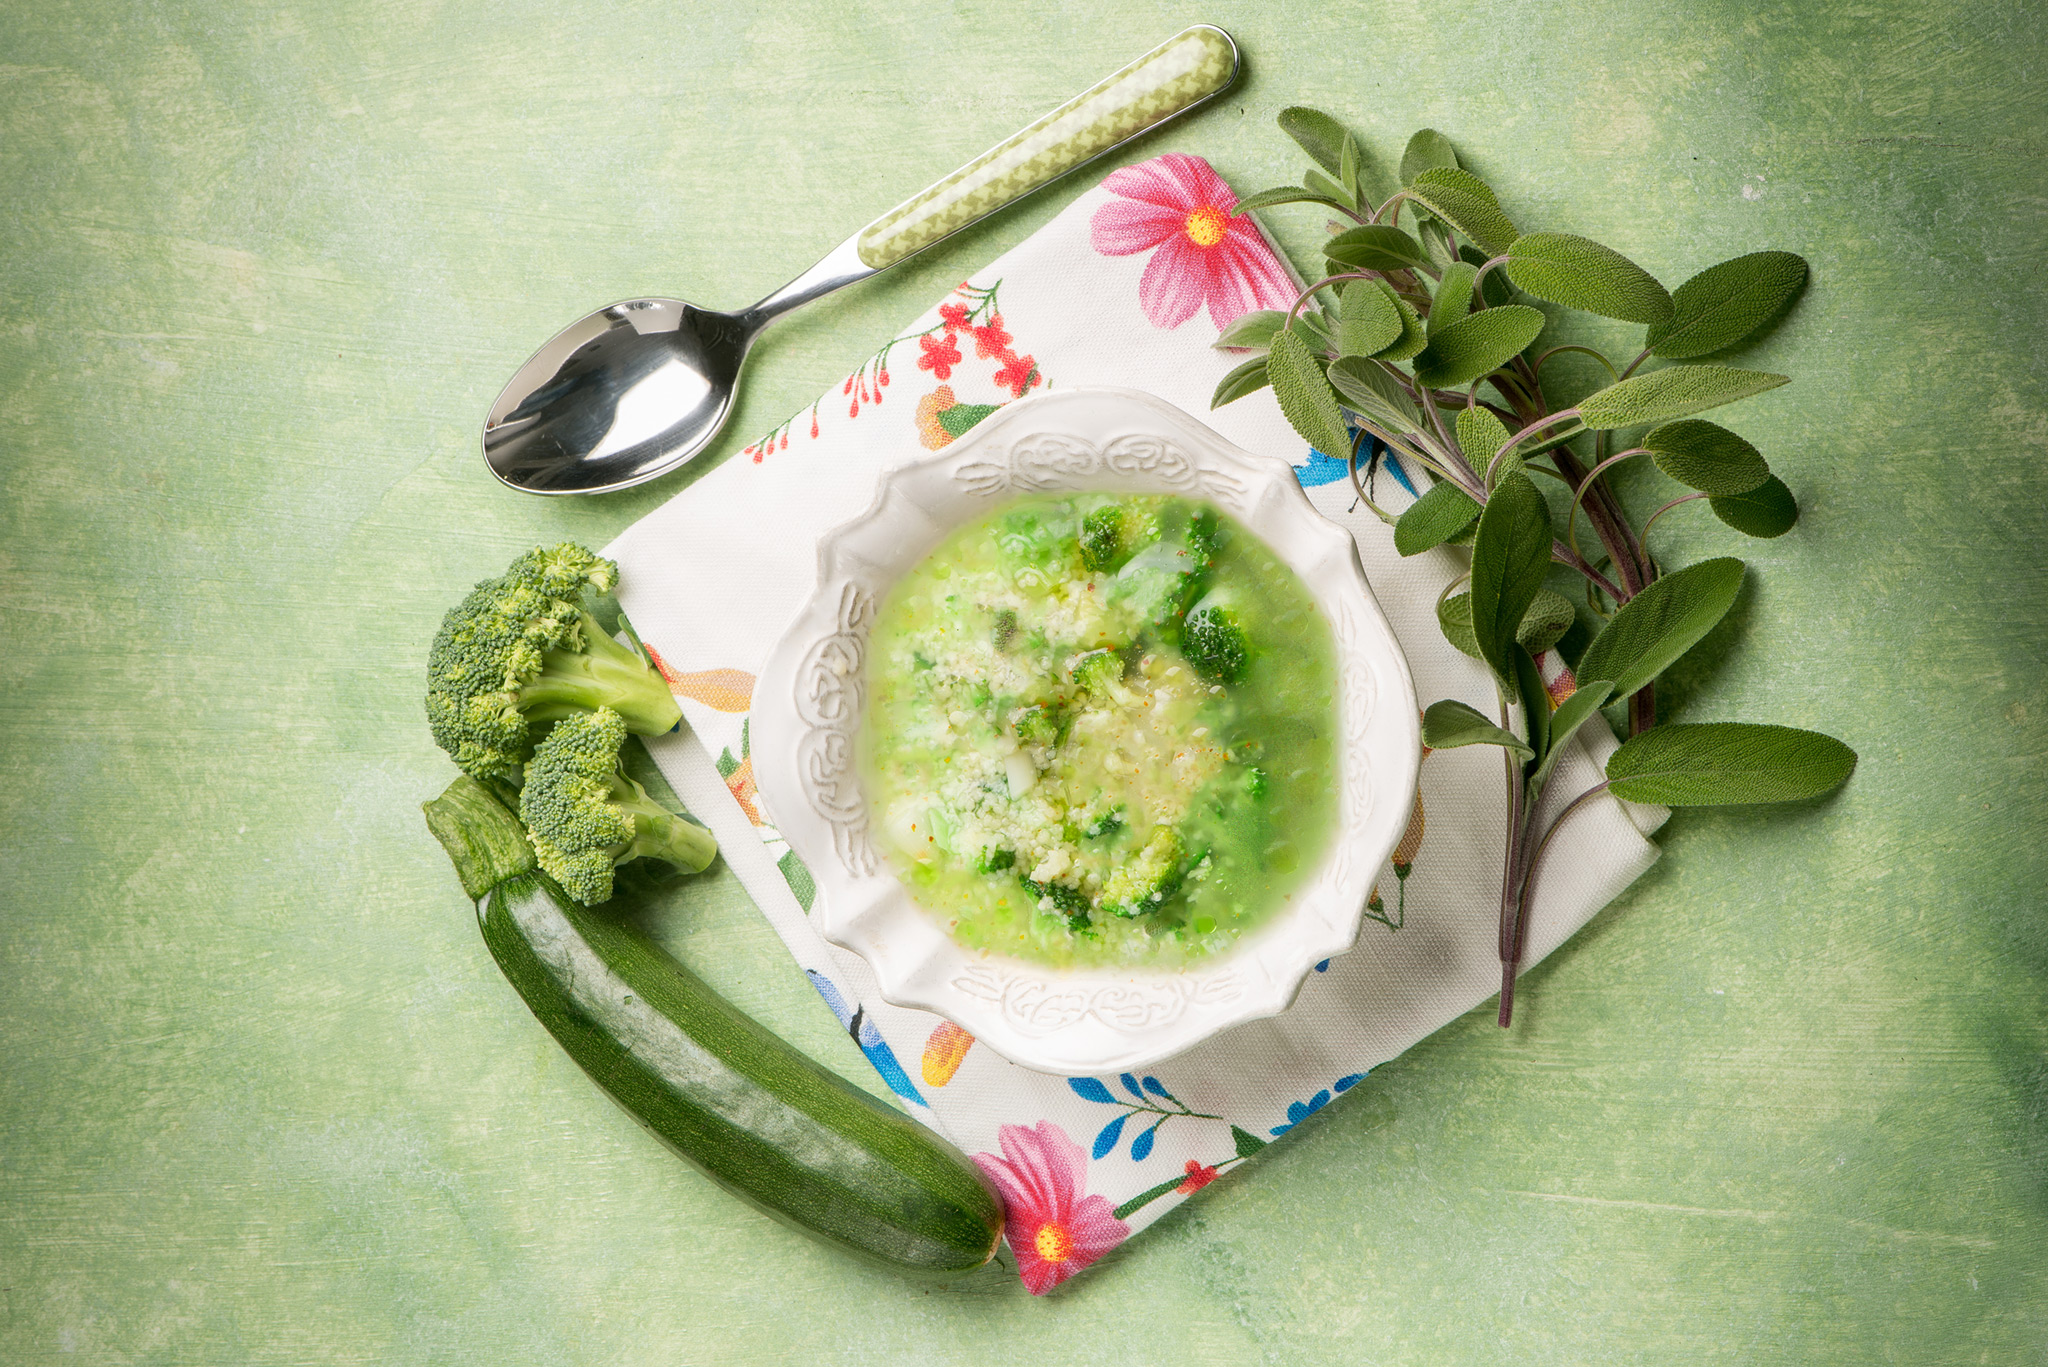 Суп из брокколи с кускусом